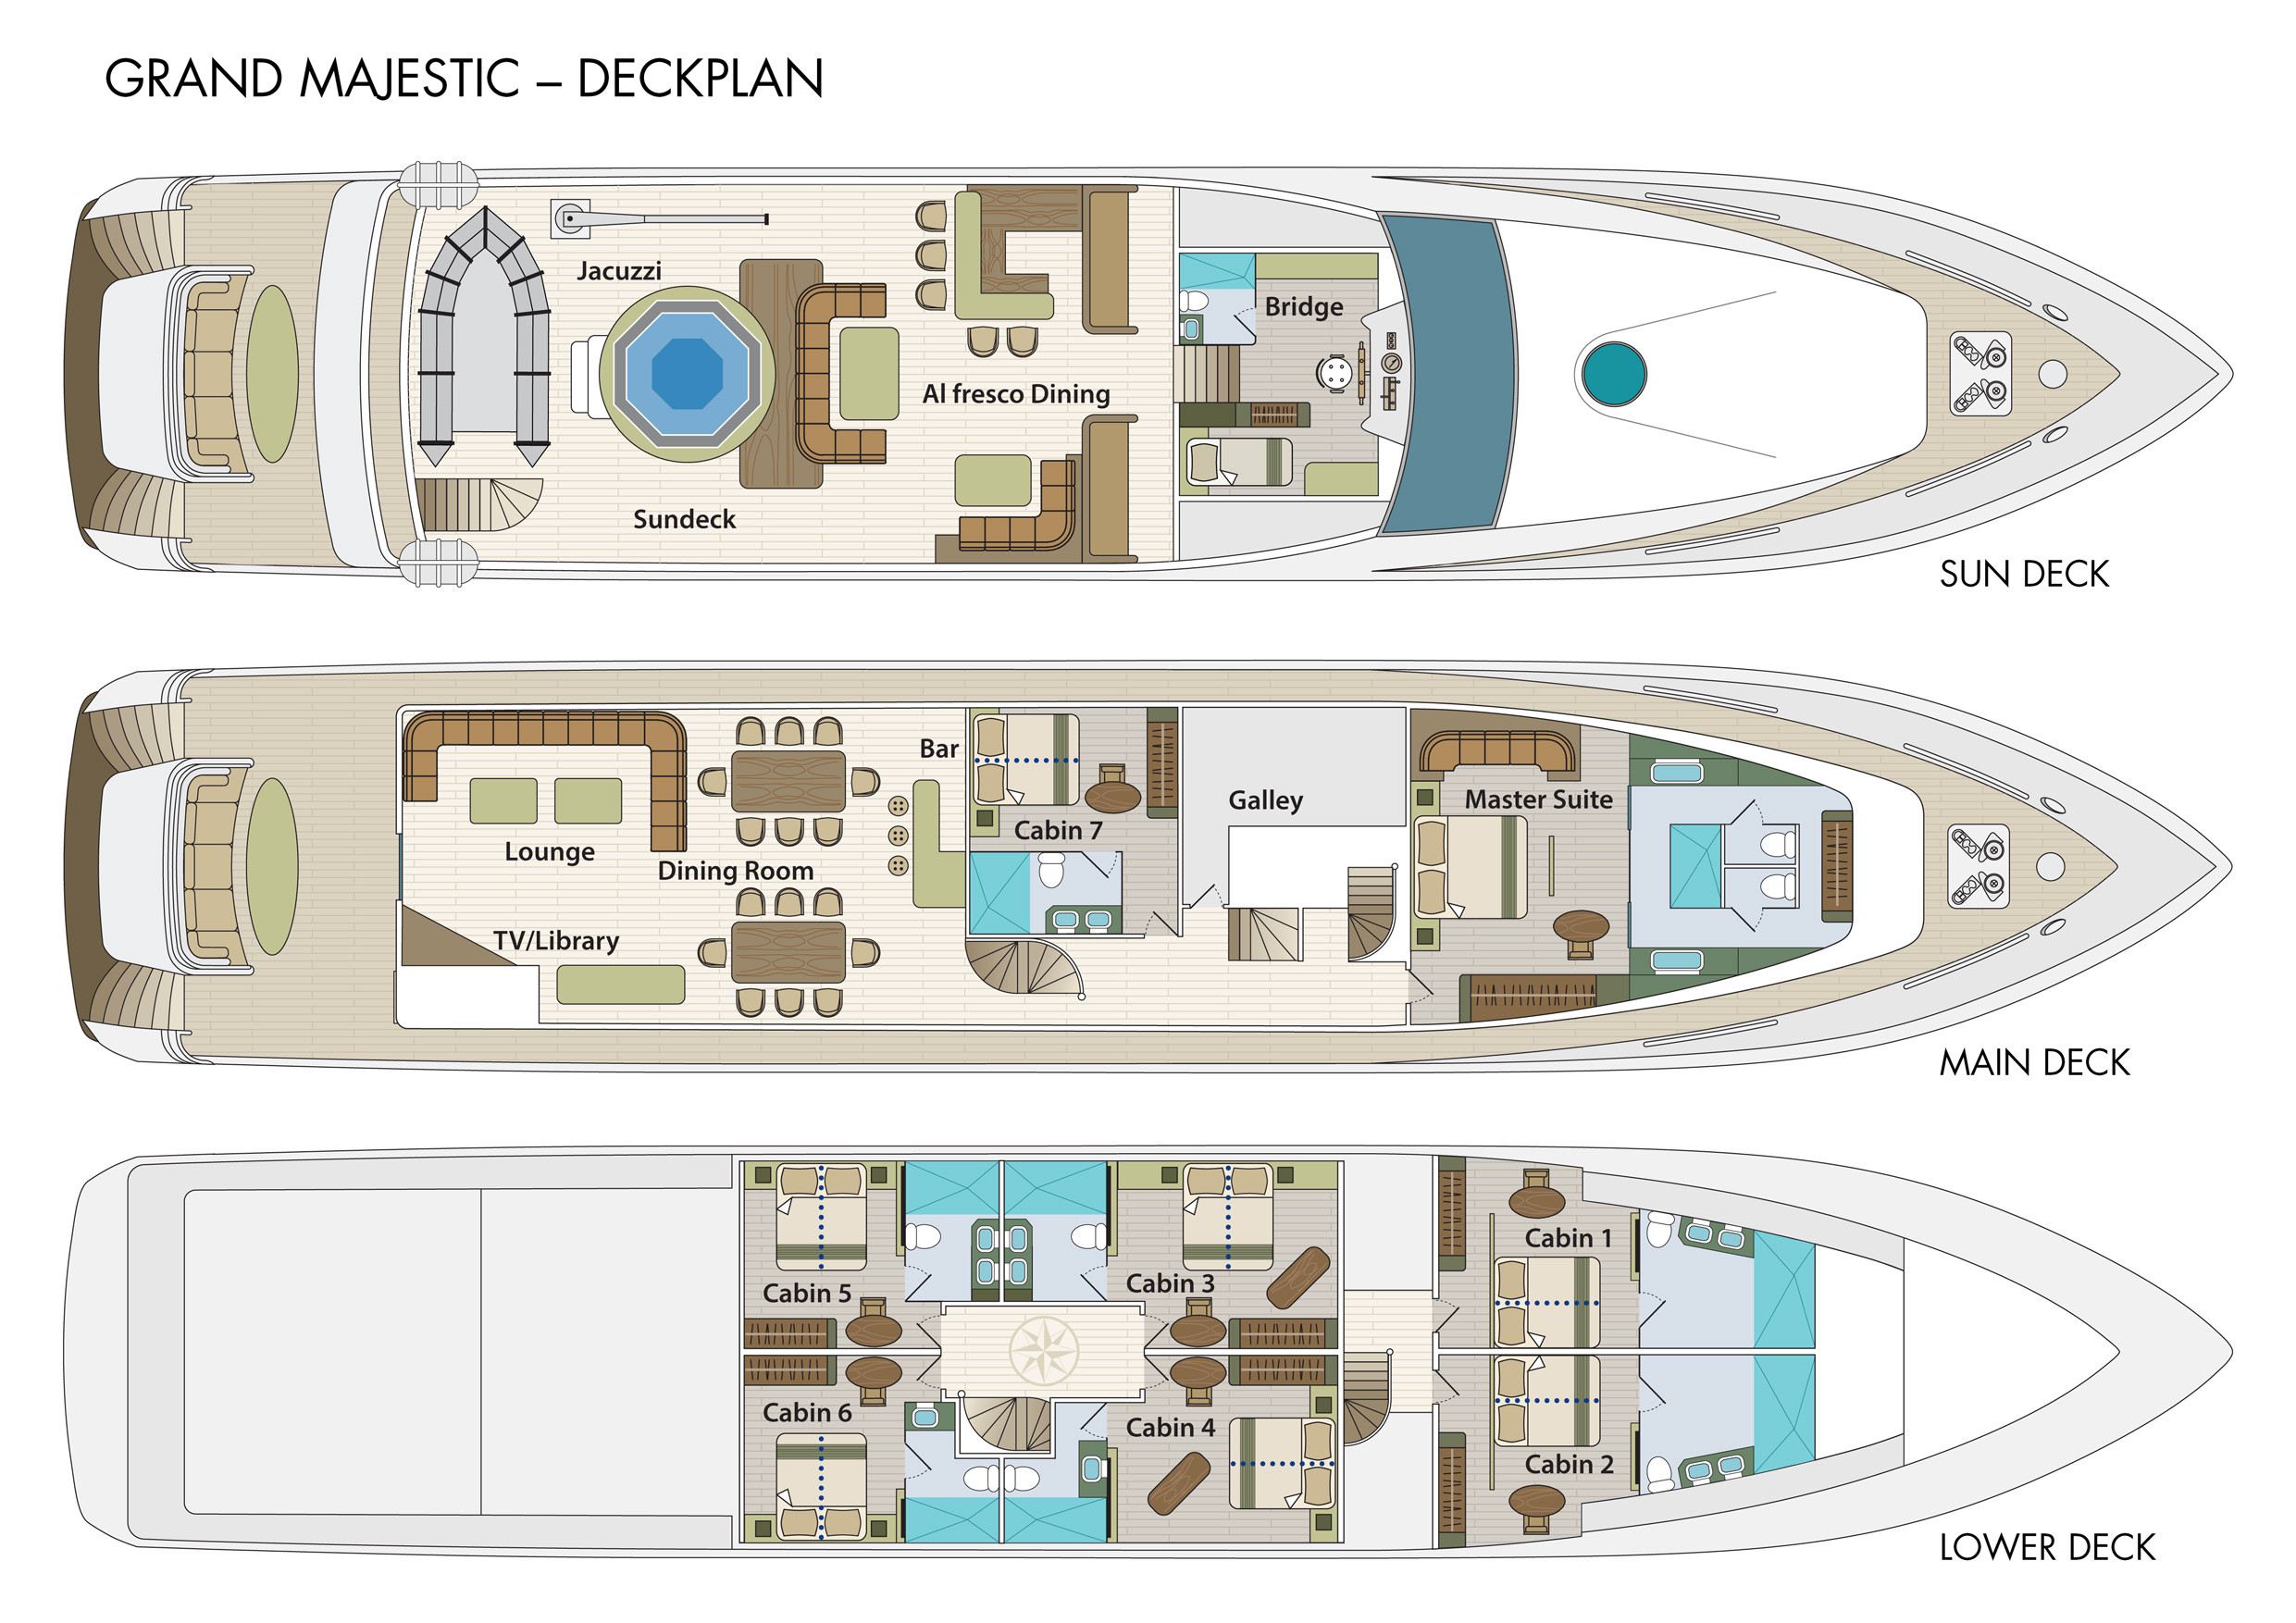 Deckplan GRAND MAJESTIC